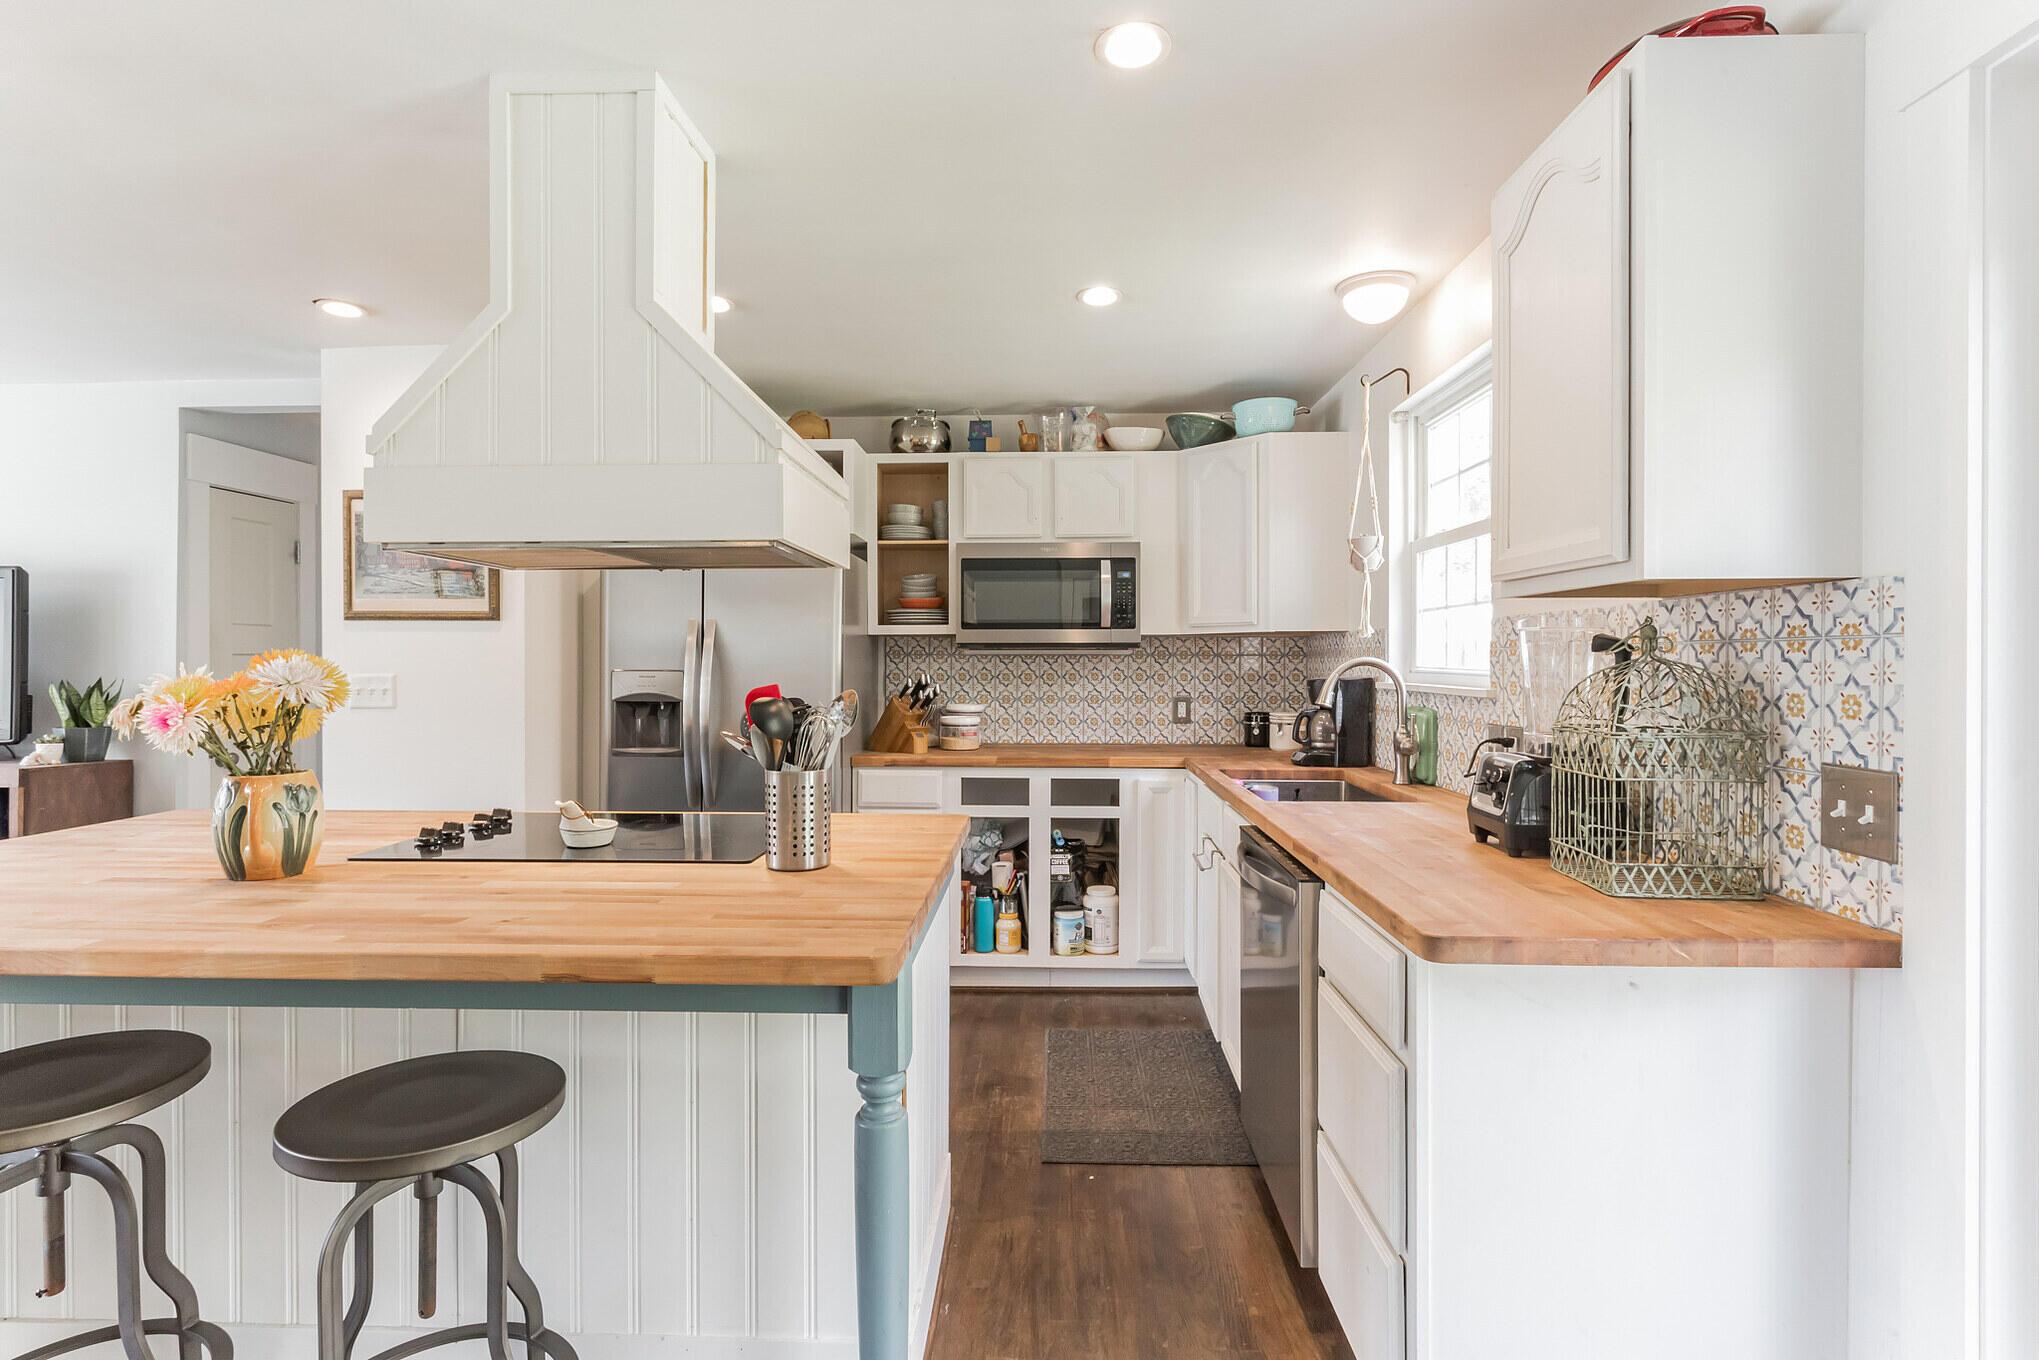 Stafford Heights Homes For Sale - 3472 Cynthia, Johns Island, SC - 5